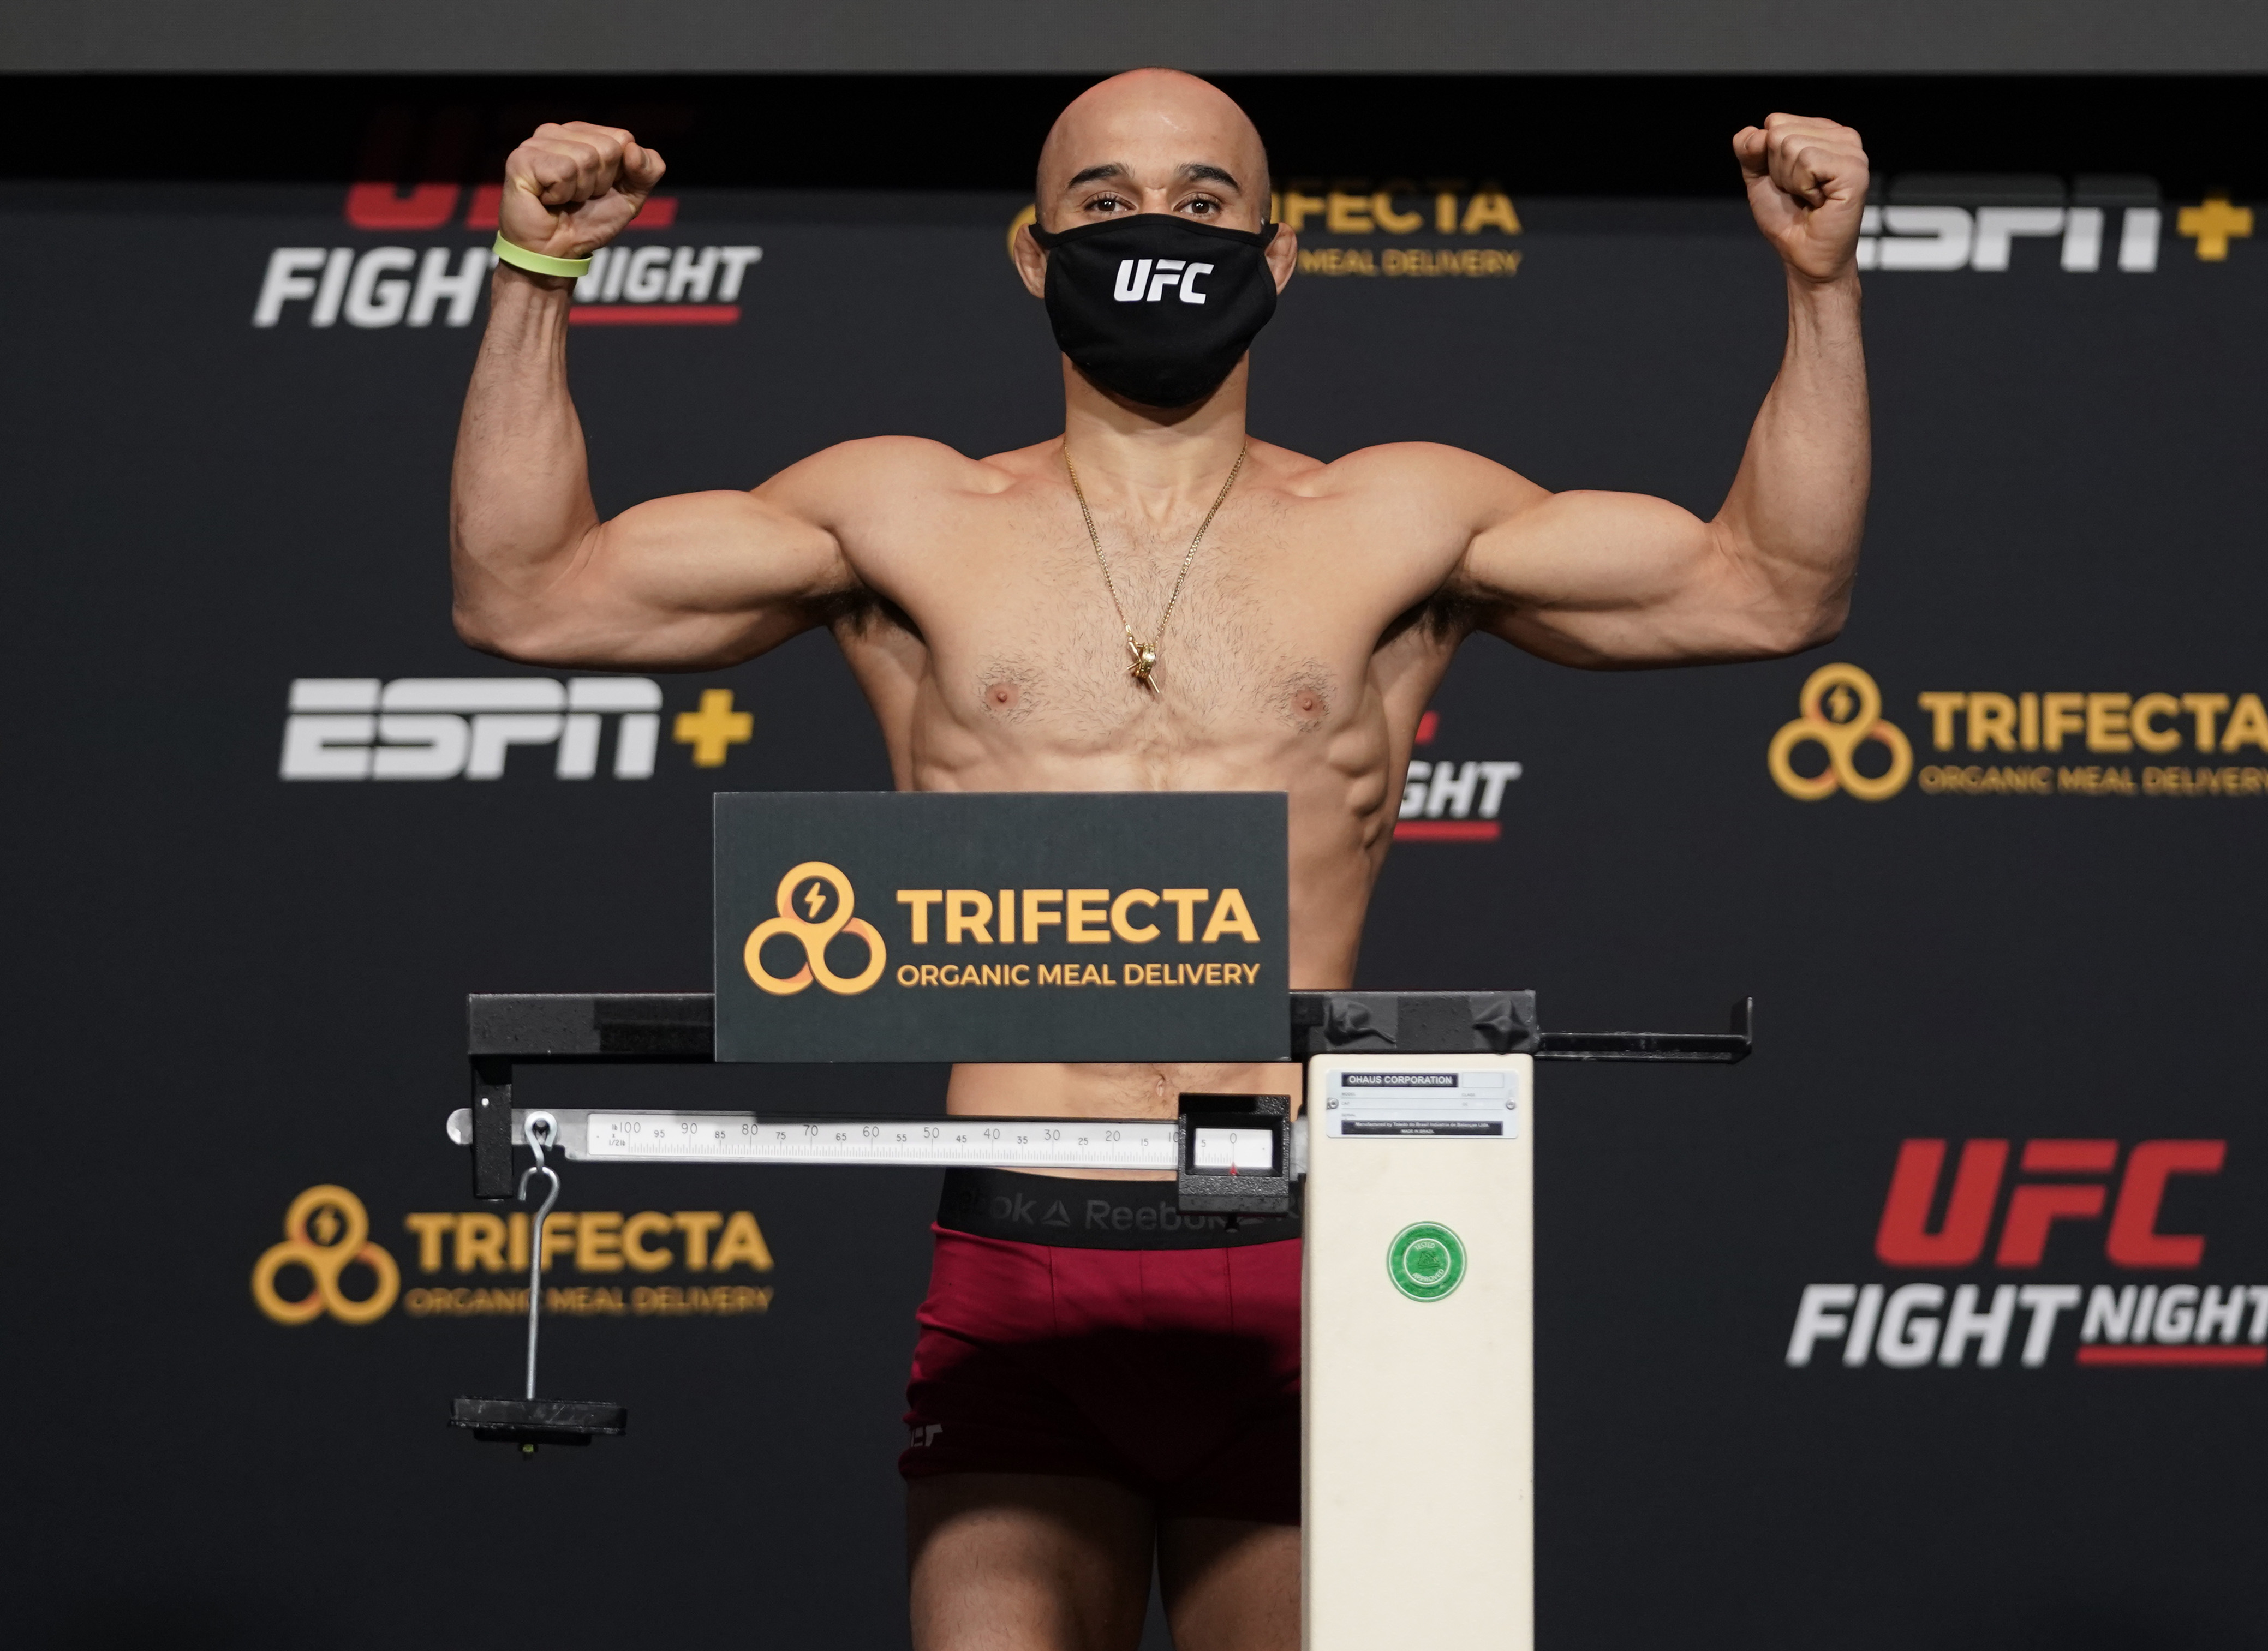 Marlon Moraes is set to face Merab Dvalishvili at UFC 266.